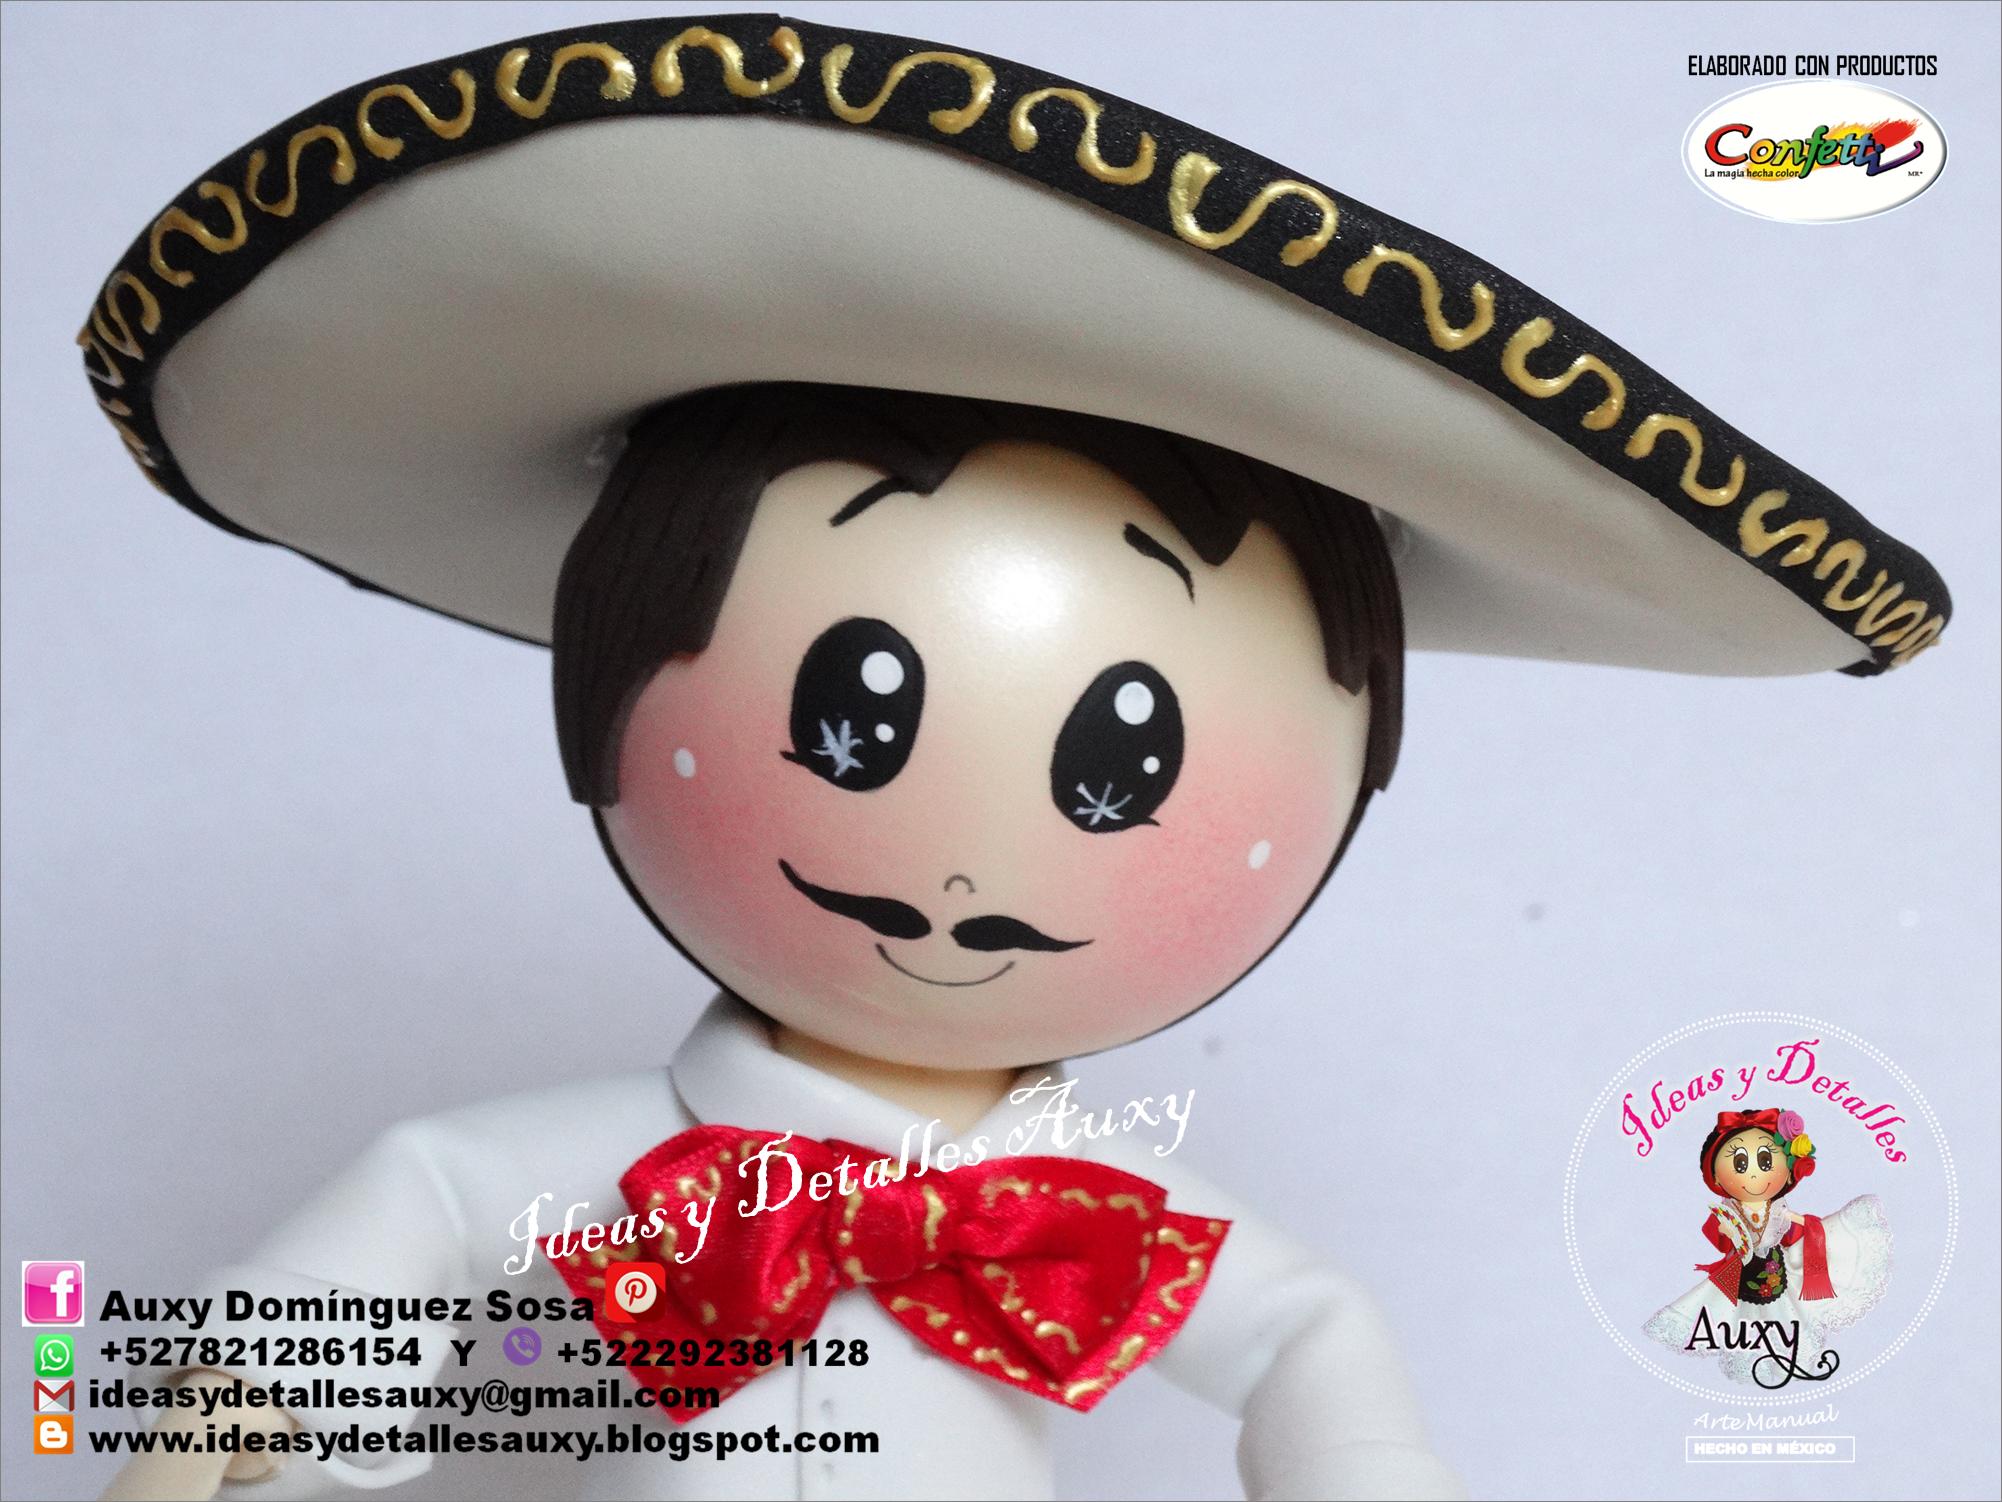 CHARRO MEXICANO CHARRO FOFUCHO VIVA MEXICO! CENTRO DE MESA FIESTA MEXICANA b80d15bf167